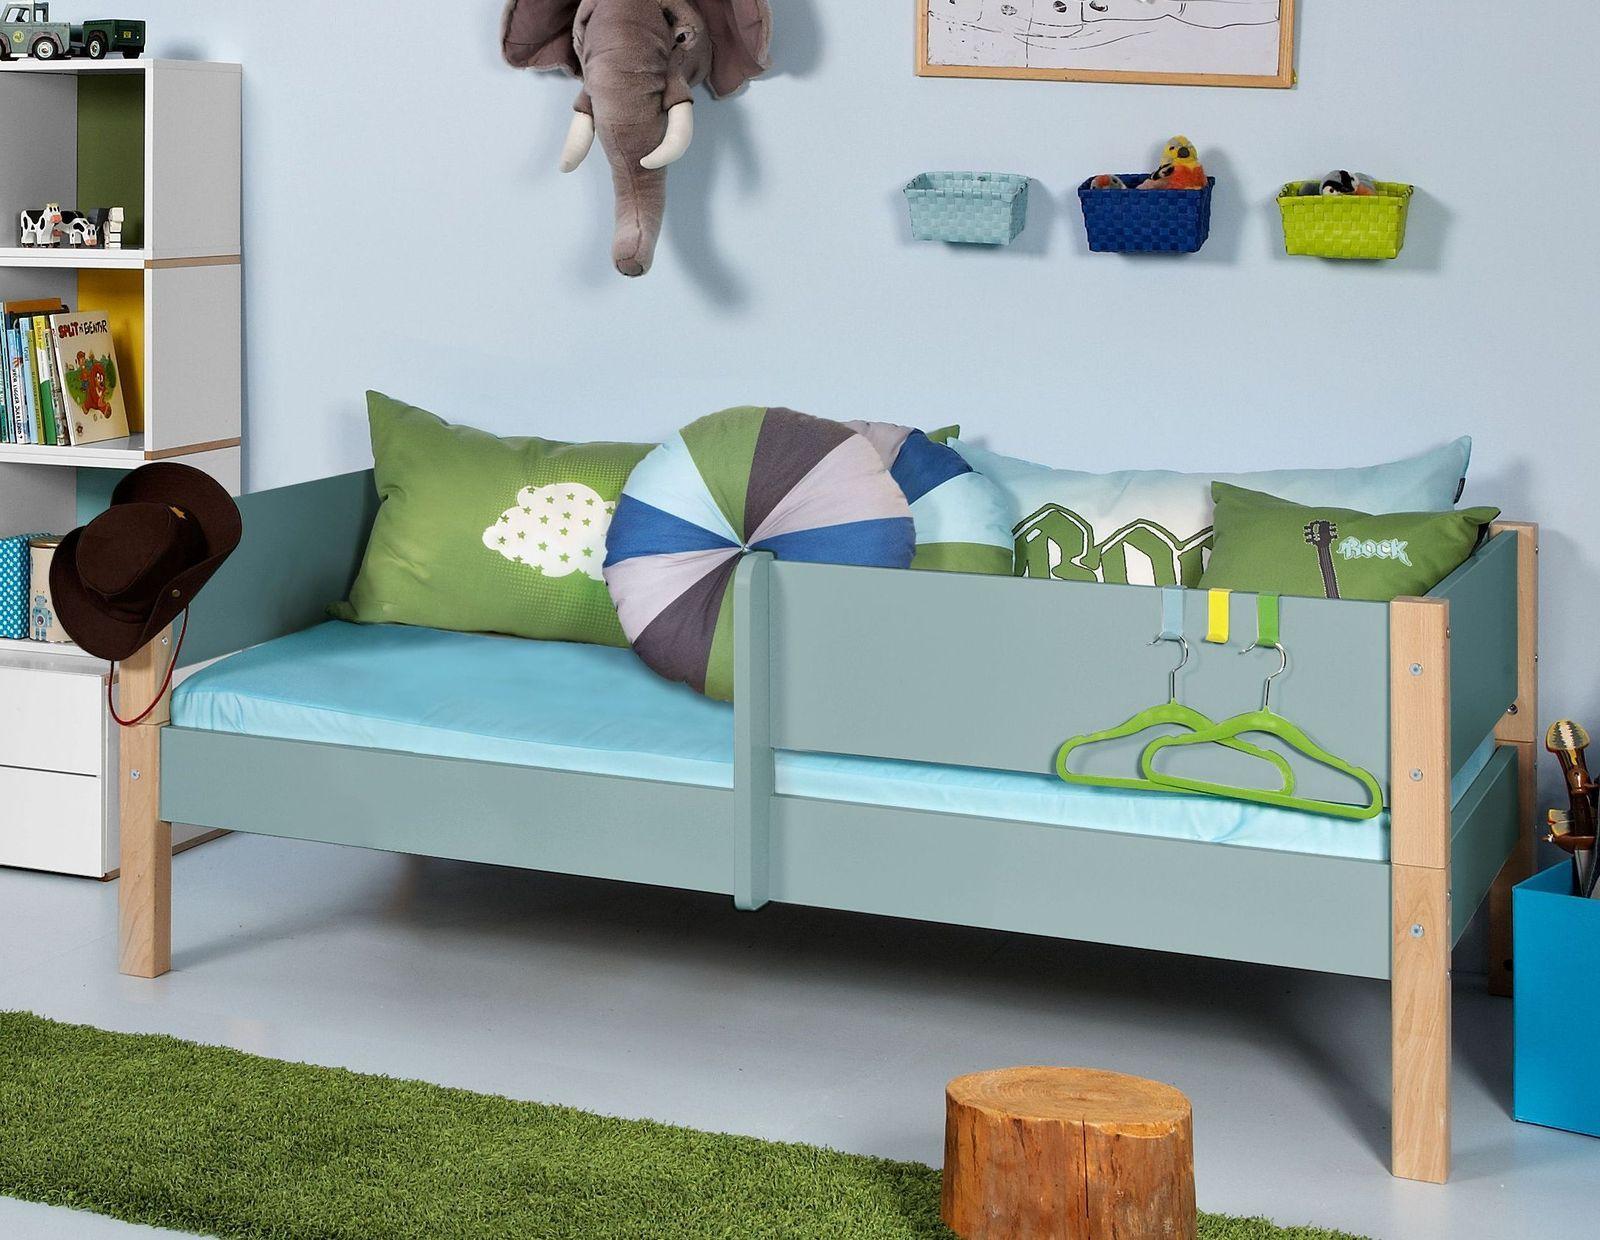 Kinderbett In Vielen Farben Mit Absturzsicherung Kids Town Color Kinder Bett Kinderbett Rausfallschutz Kinderbett